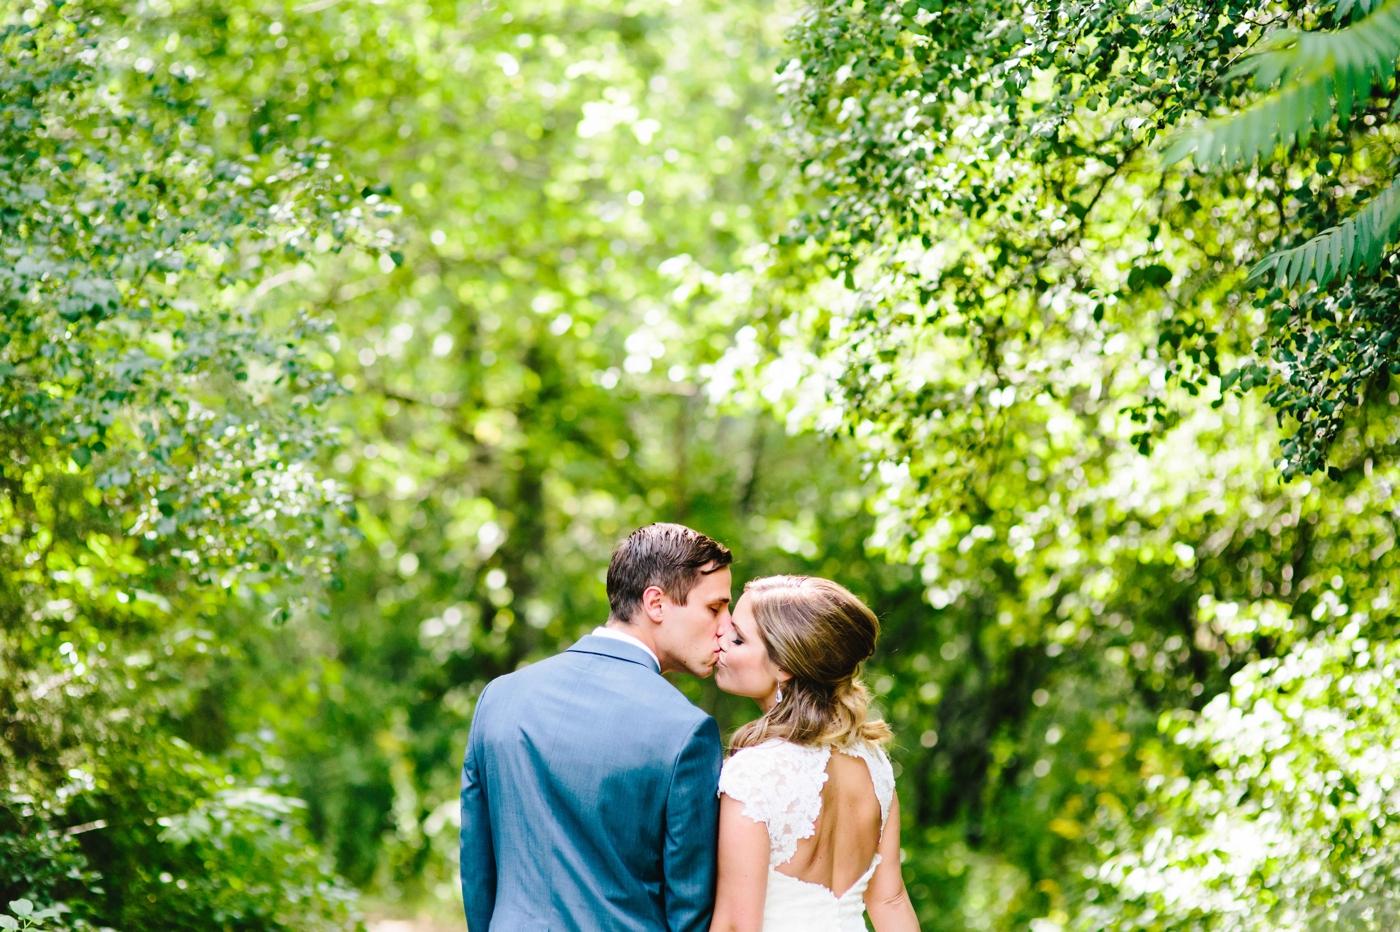 chicago-fine-art-wedding-photography-chiapetta37